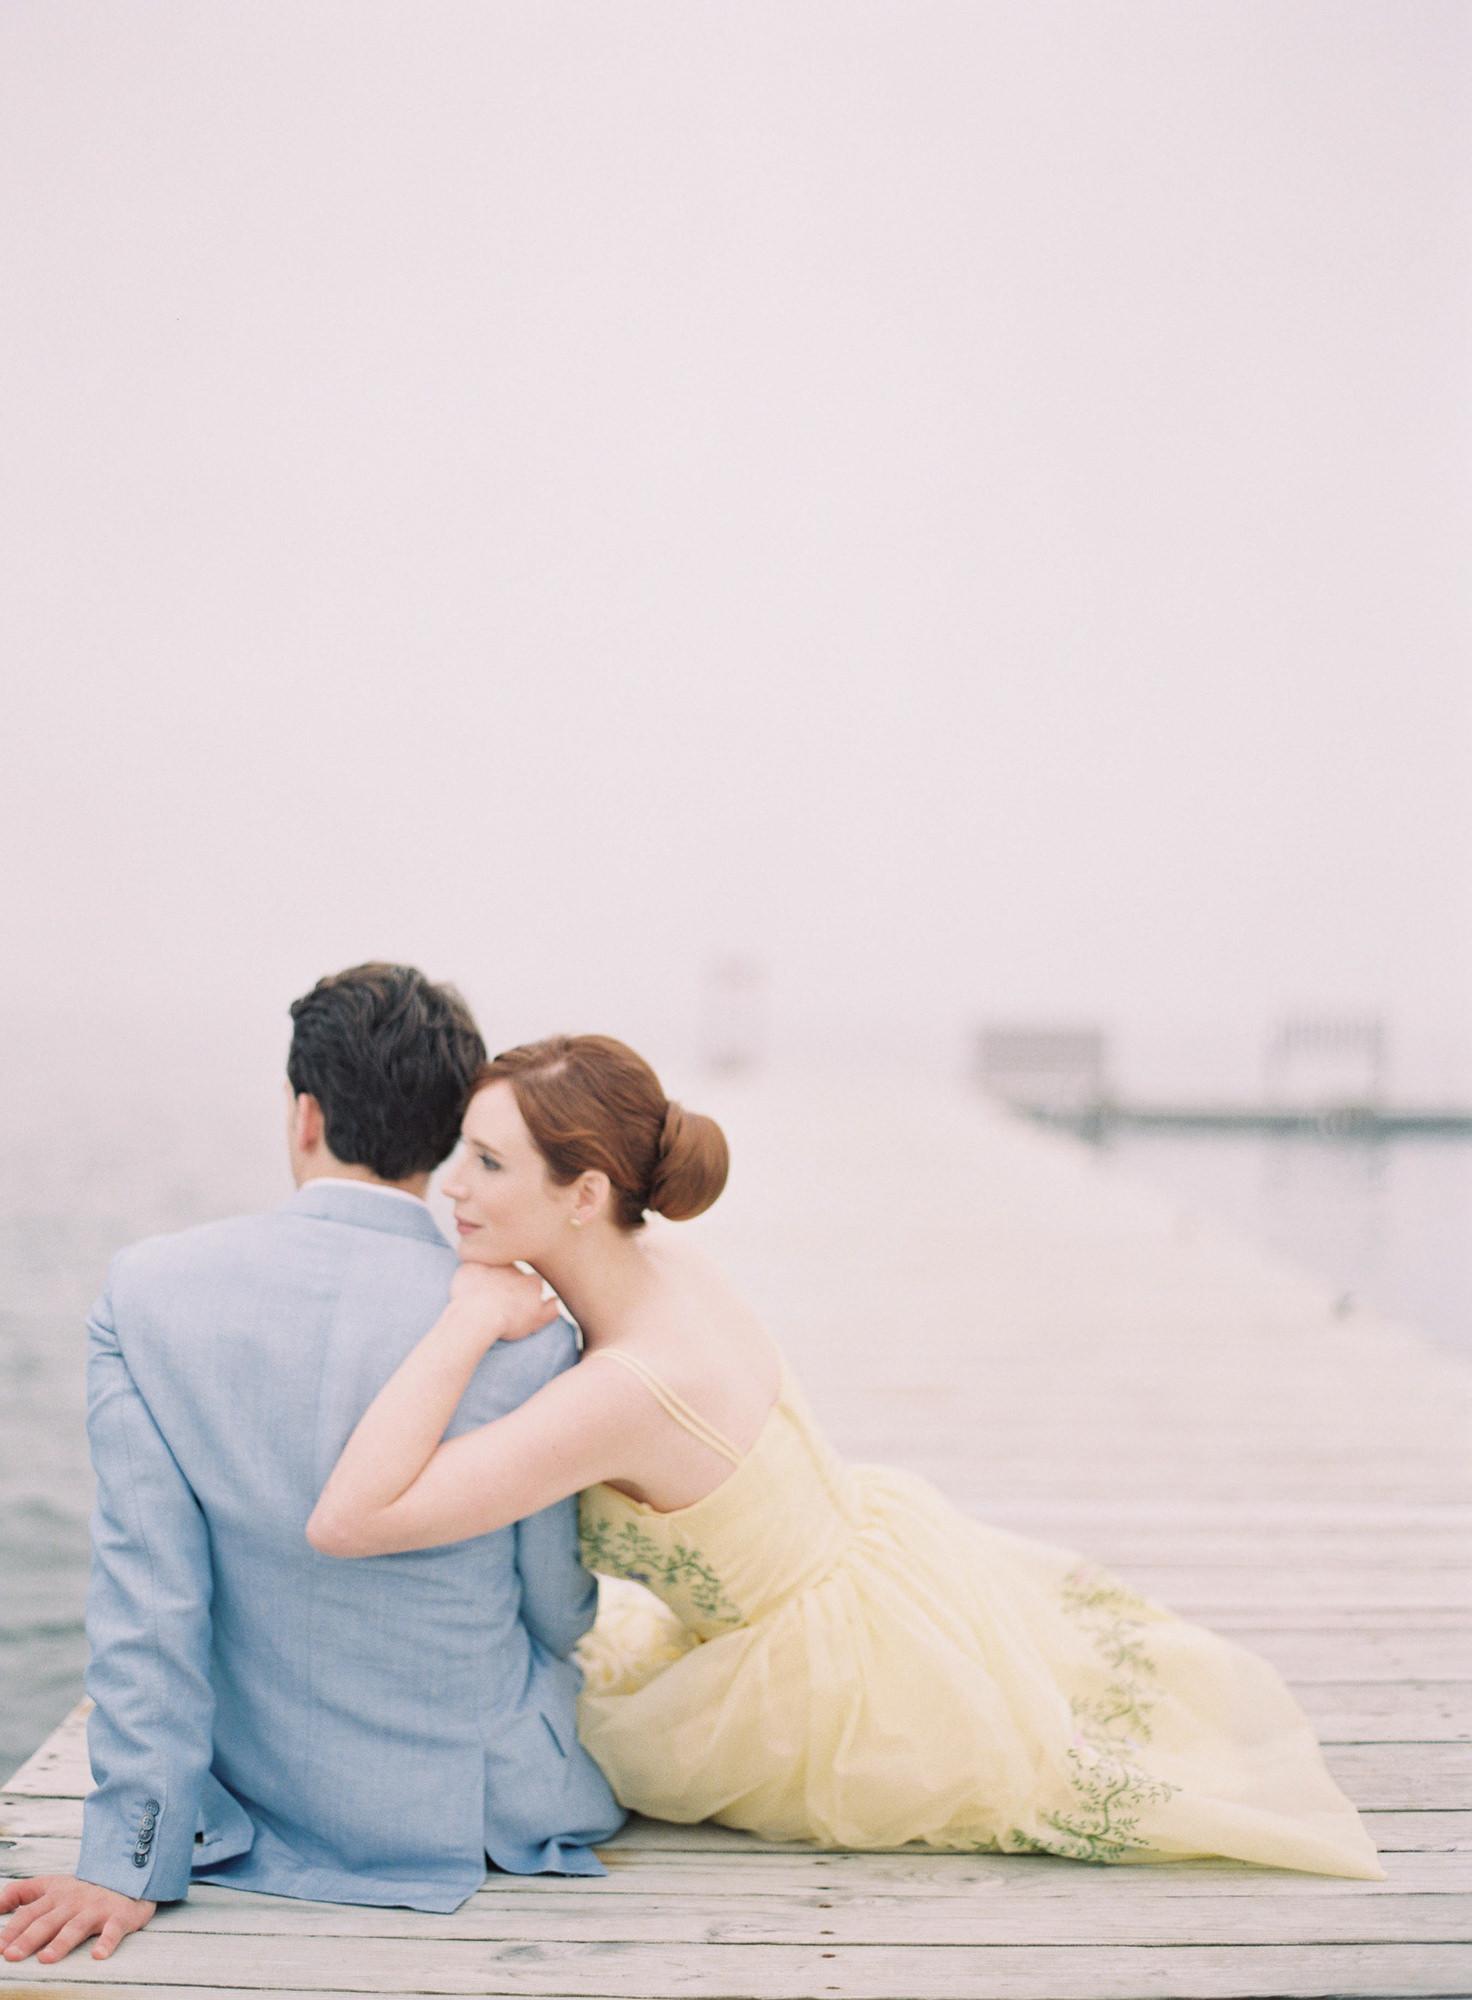 worlds-best-wedding-photos-portrait-of-couple-on-pier-jen-huang-los-angeles-wedding-photographer